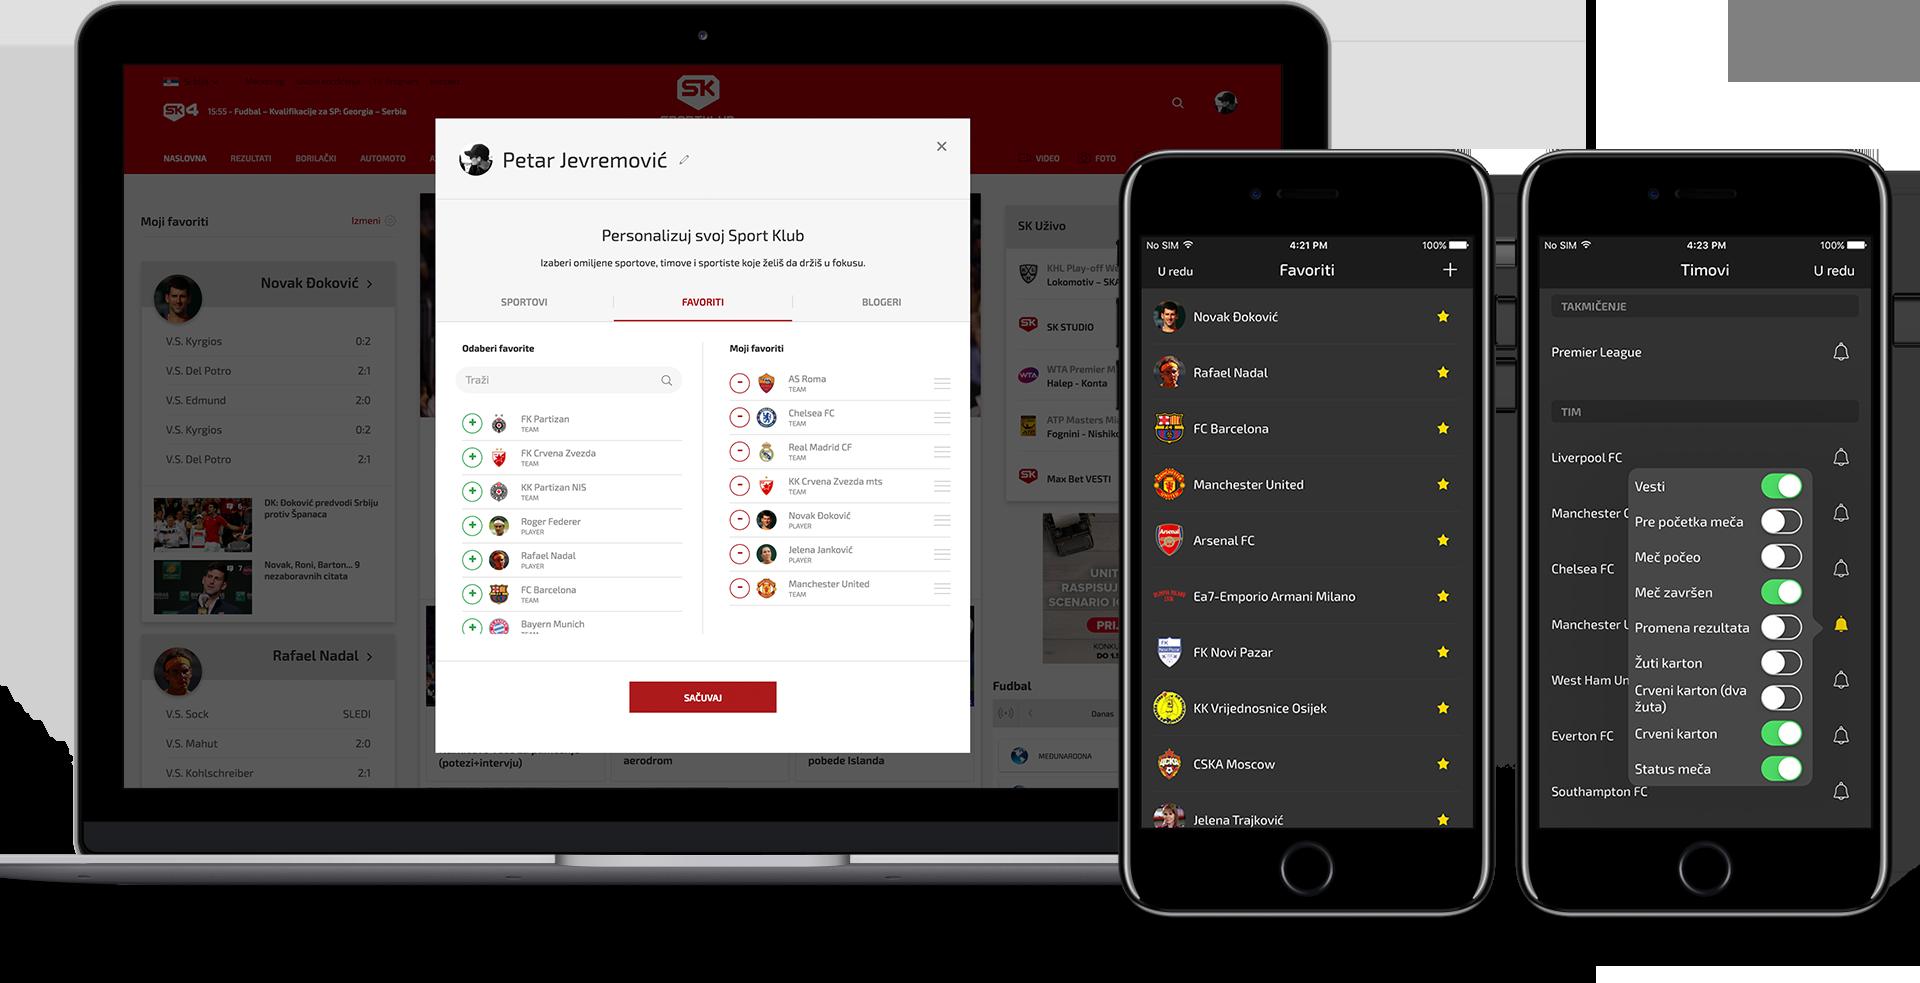 Sportklub personalize profile